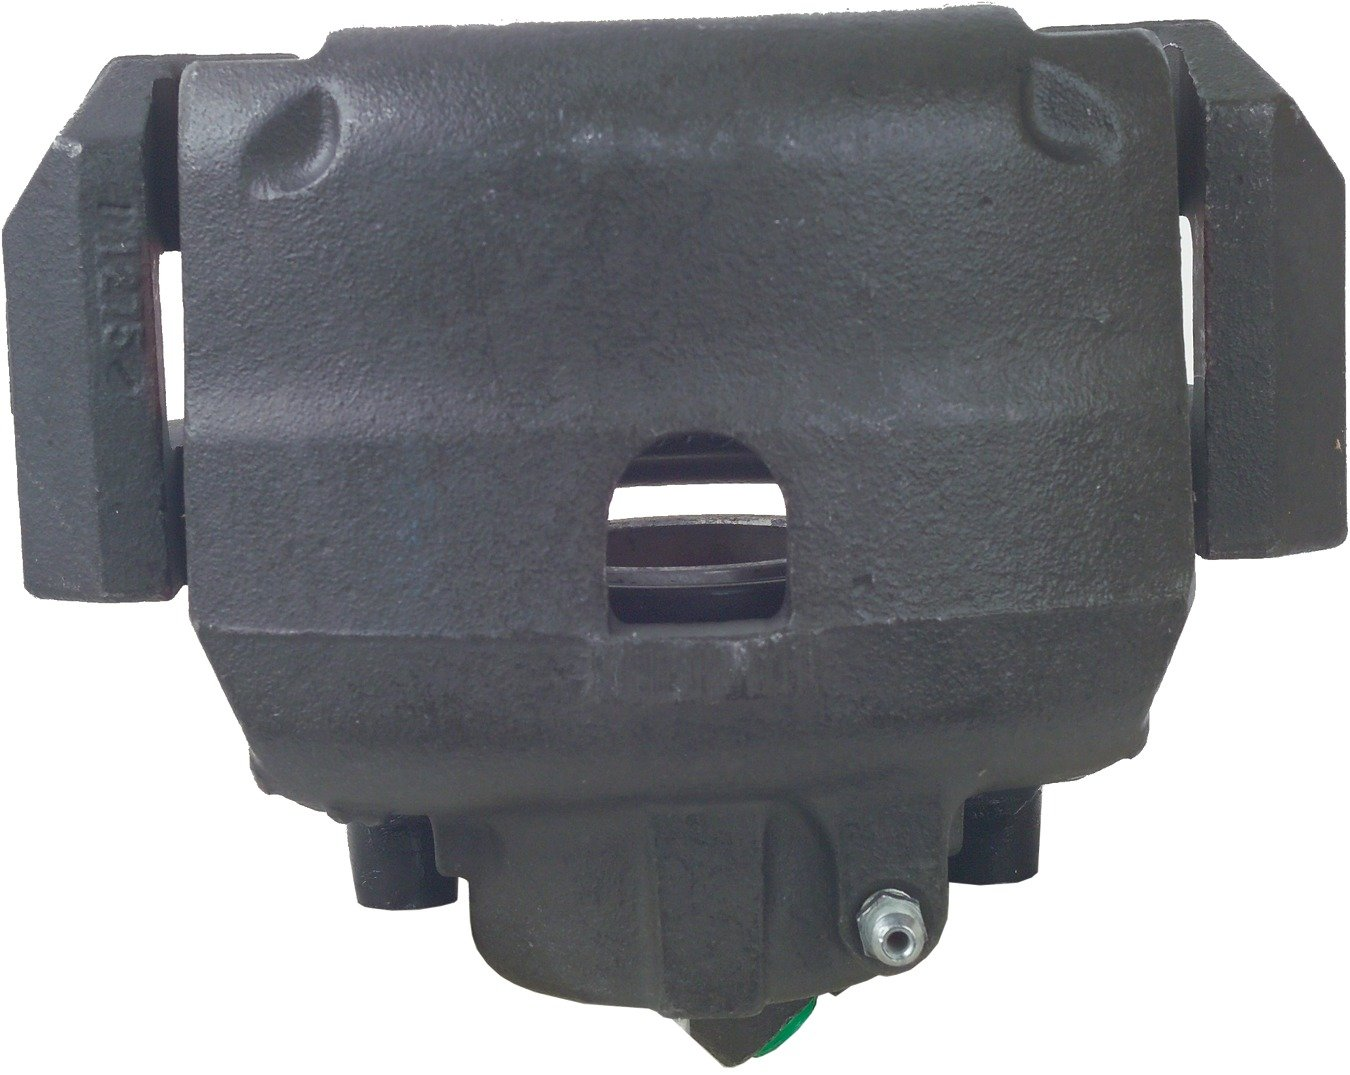 Cardone 18-B4779 Remanufactured Domestic Friction Ready Brake Caliper Unloaded